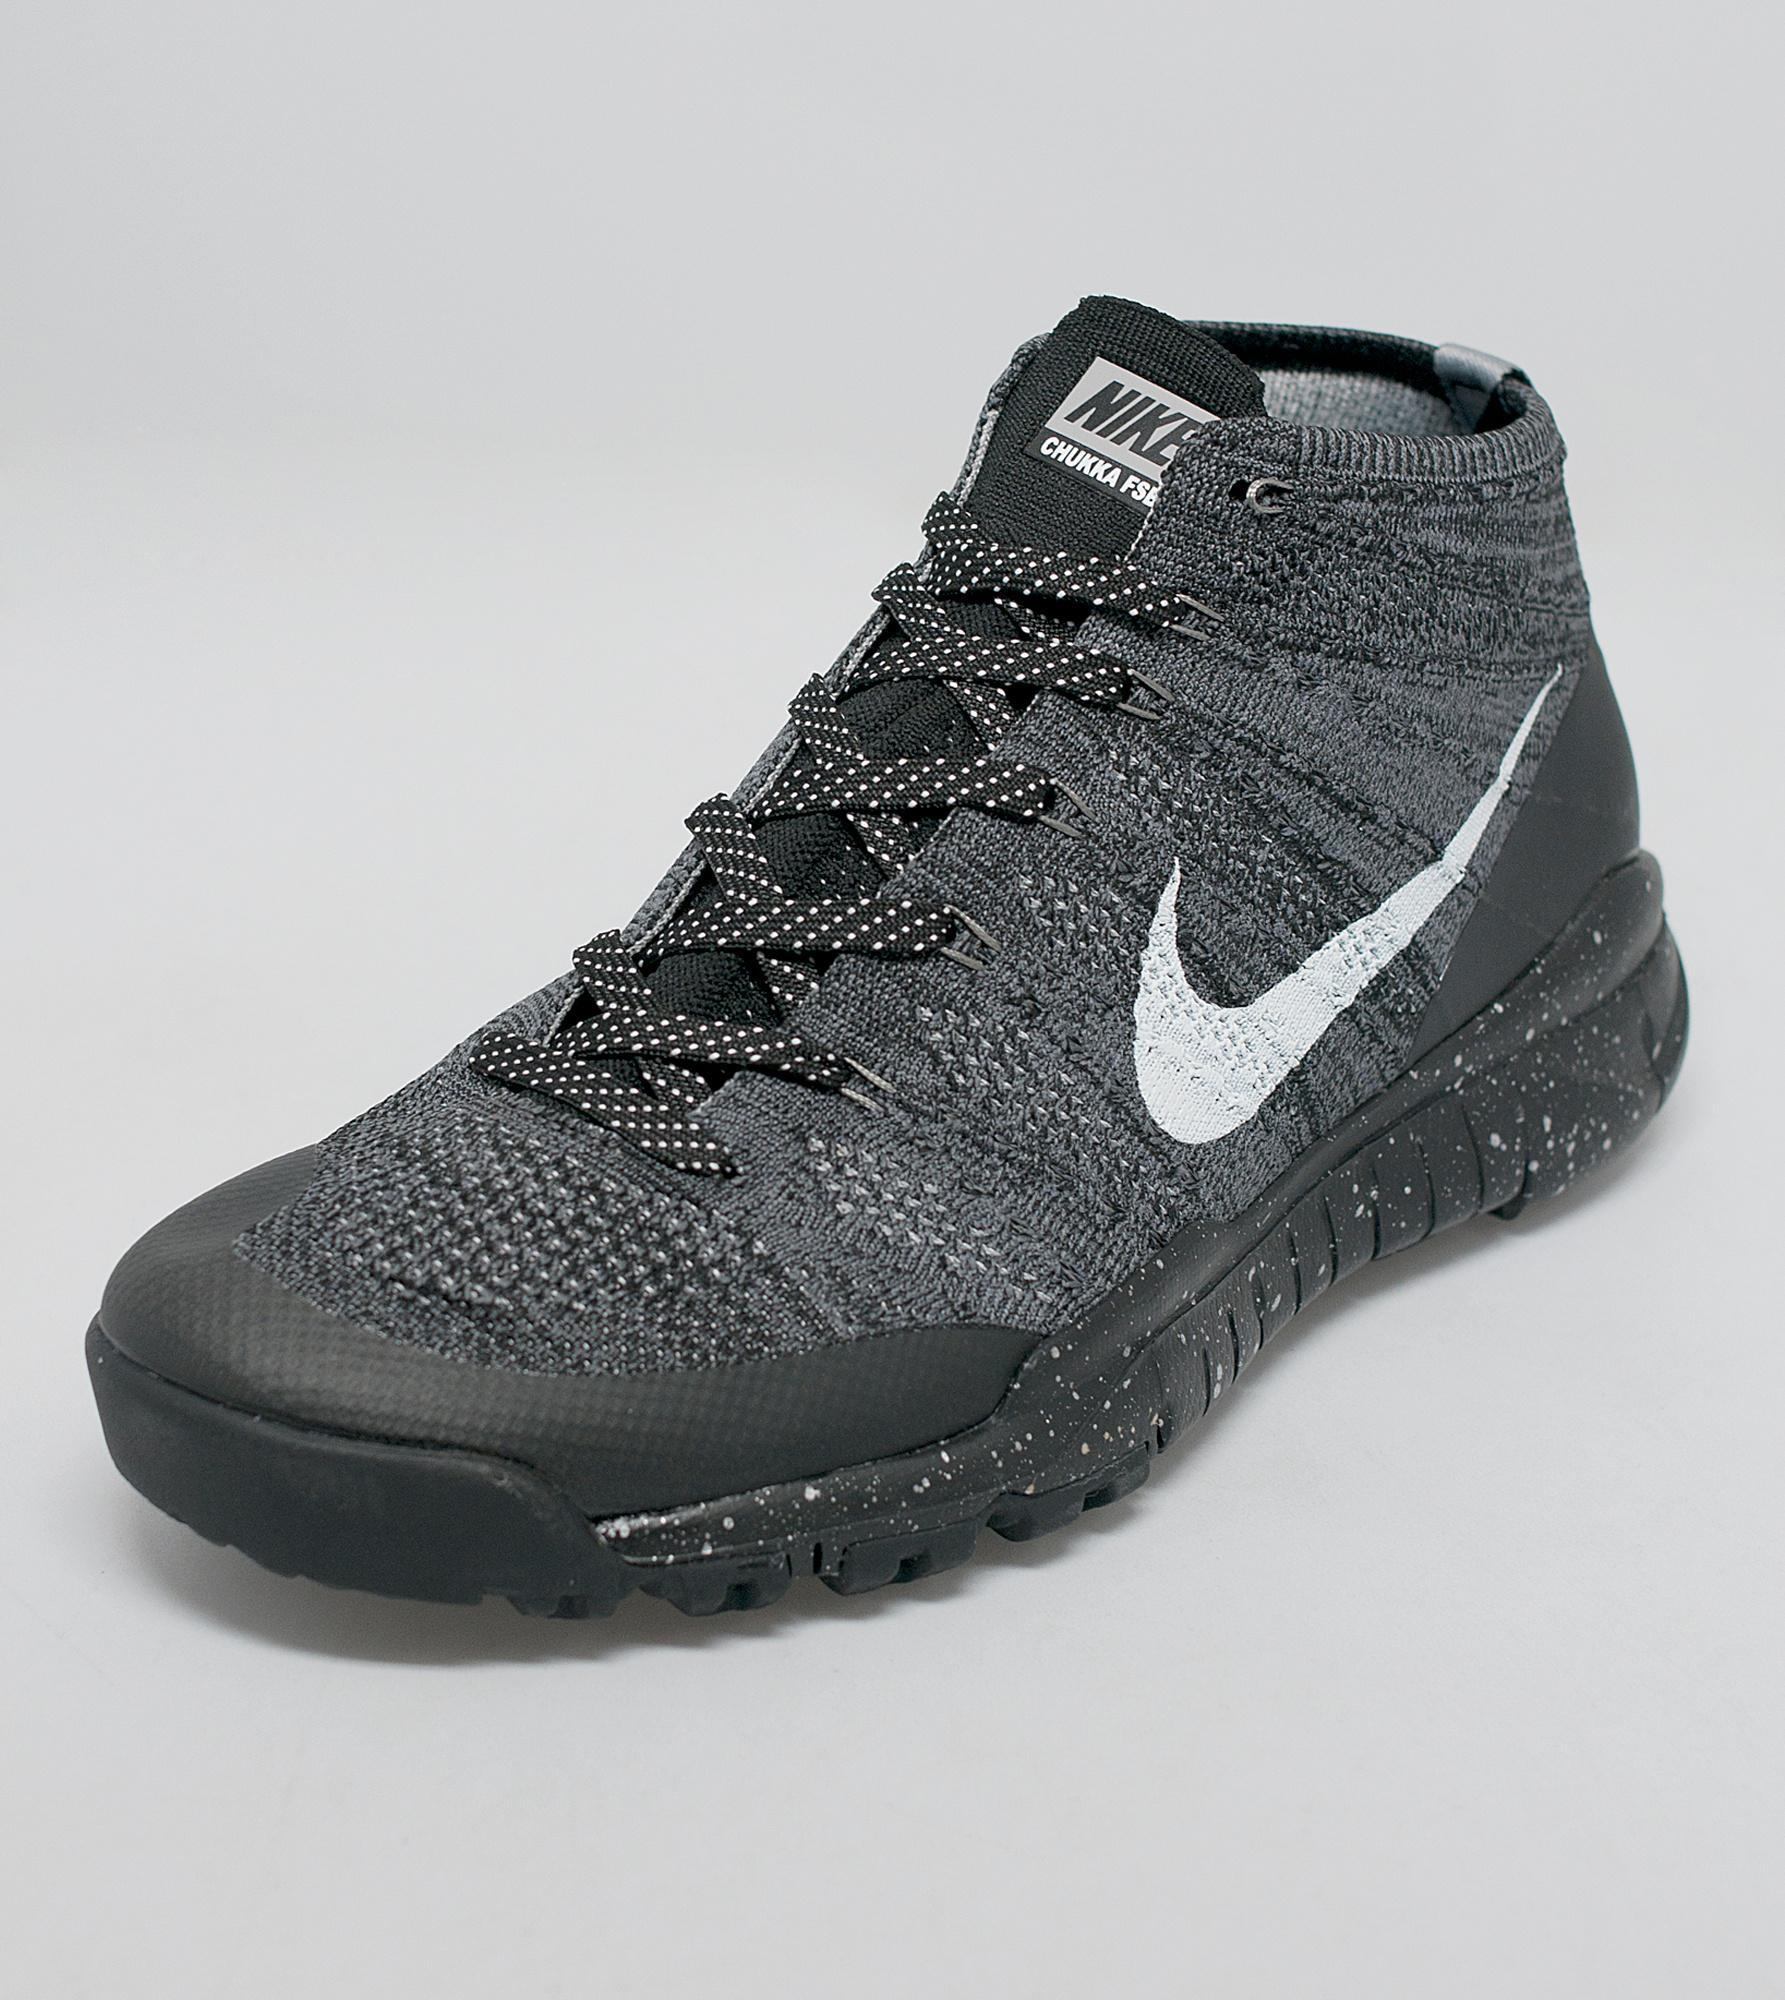 90f40710e889 Nike Flyknit Trainer Chukka Size 14